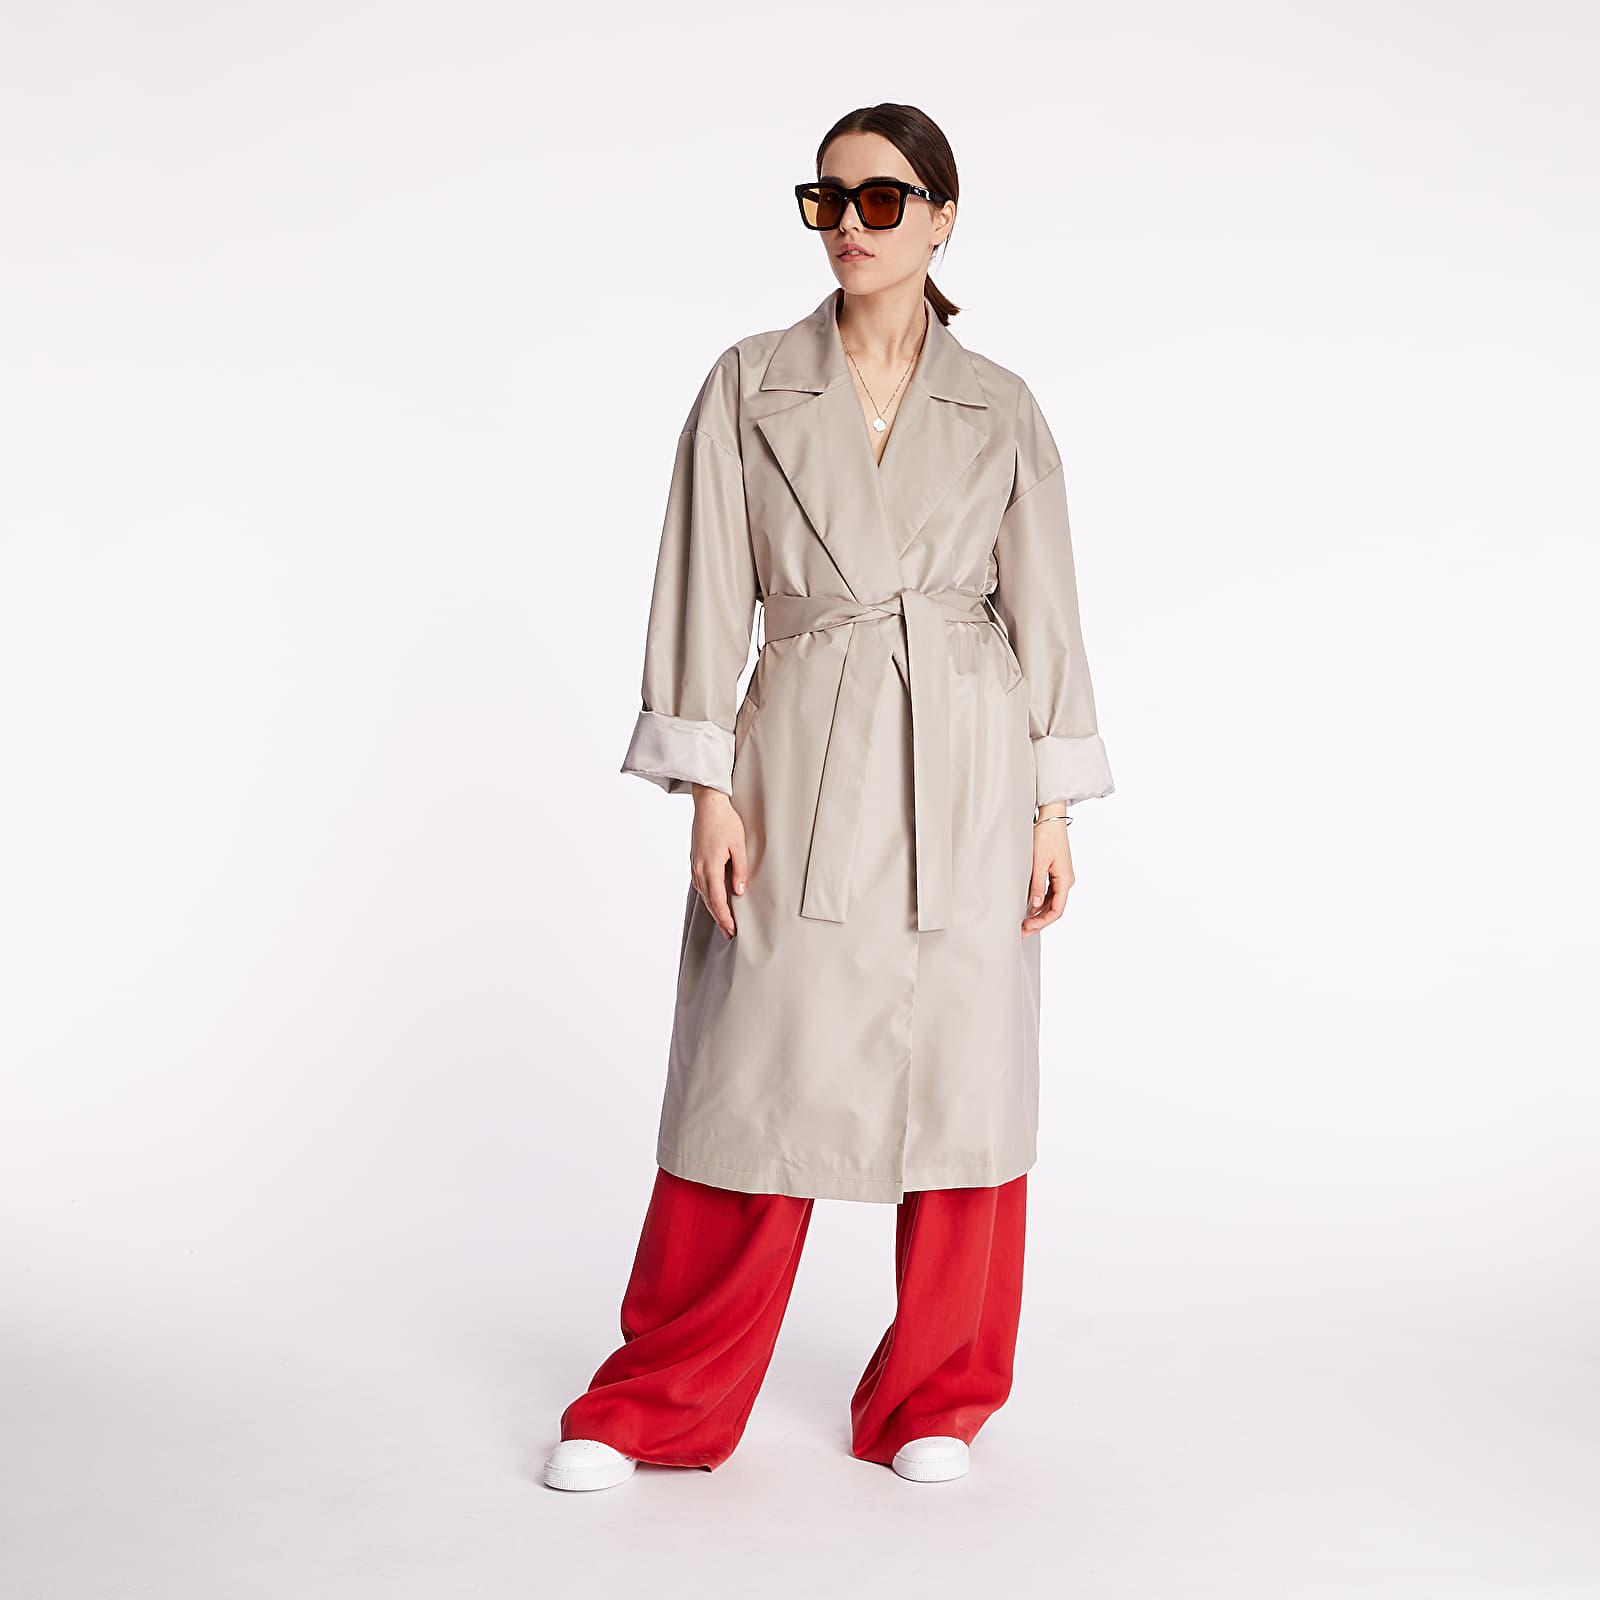 Coats Pietro Filipi Lady's Spring Coat Beige